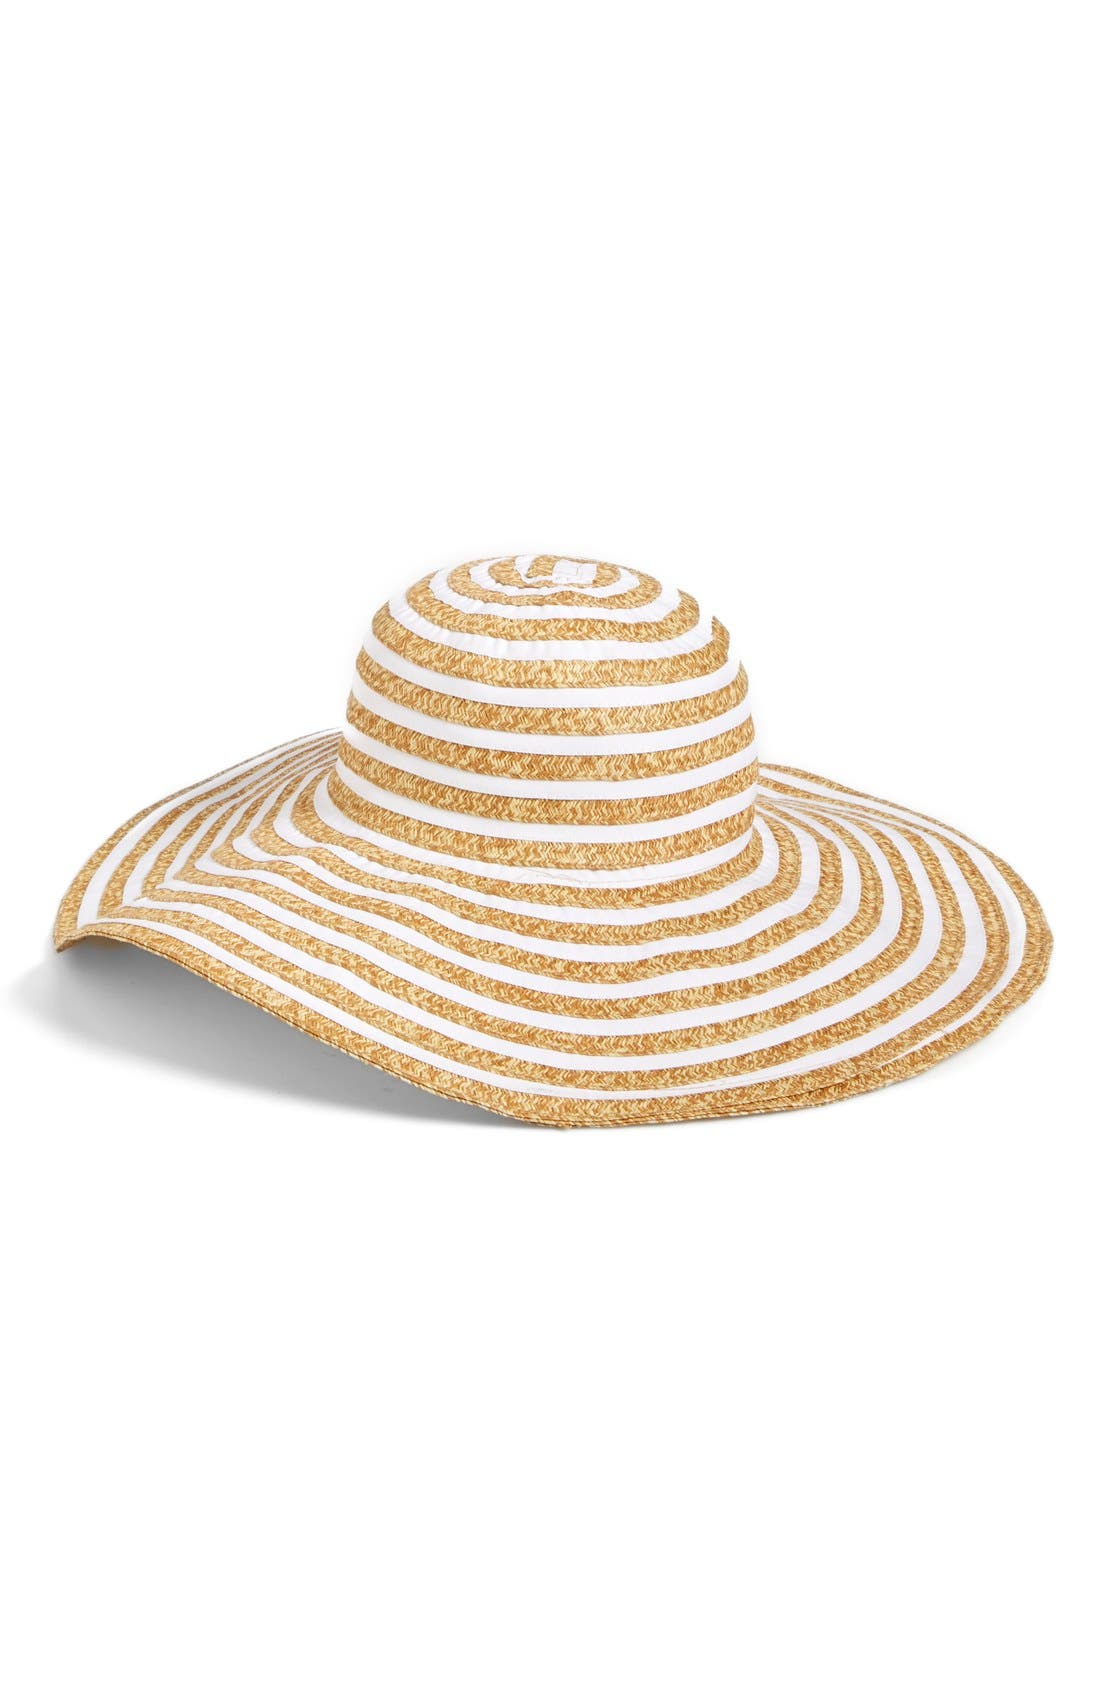 Main Image - August Hat 'Mix It Up' Floppy Straw Hat